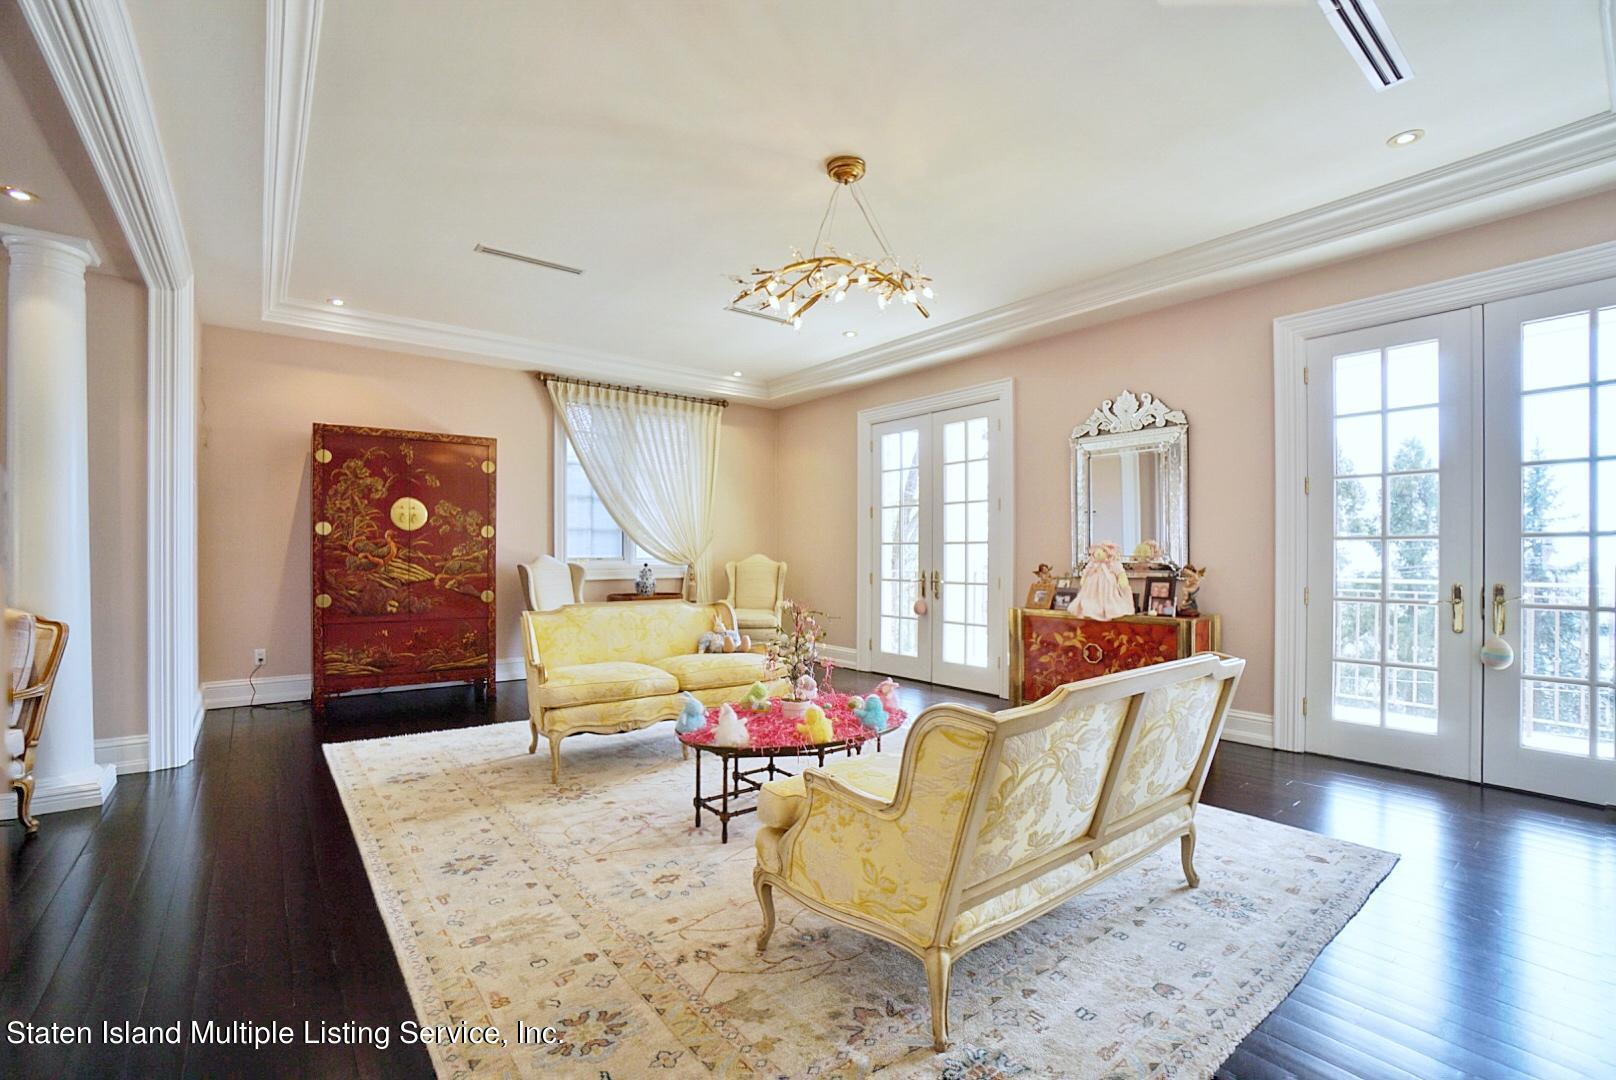 Single Family - Detached 129 Coverly Avenue   Staten Island, NY 10301, MLS-1144490-21